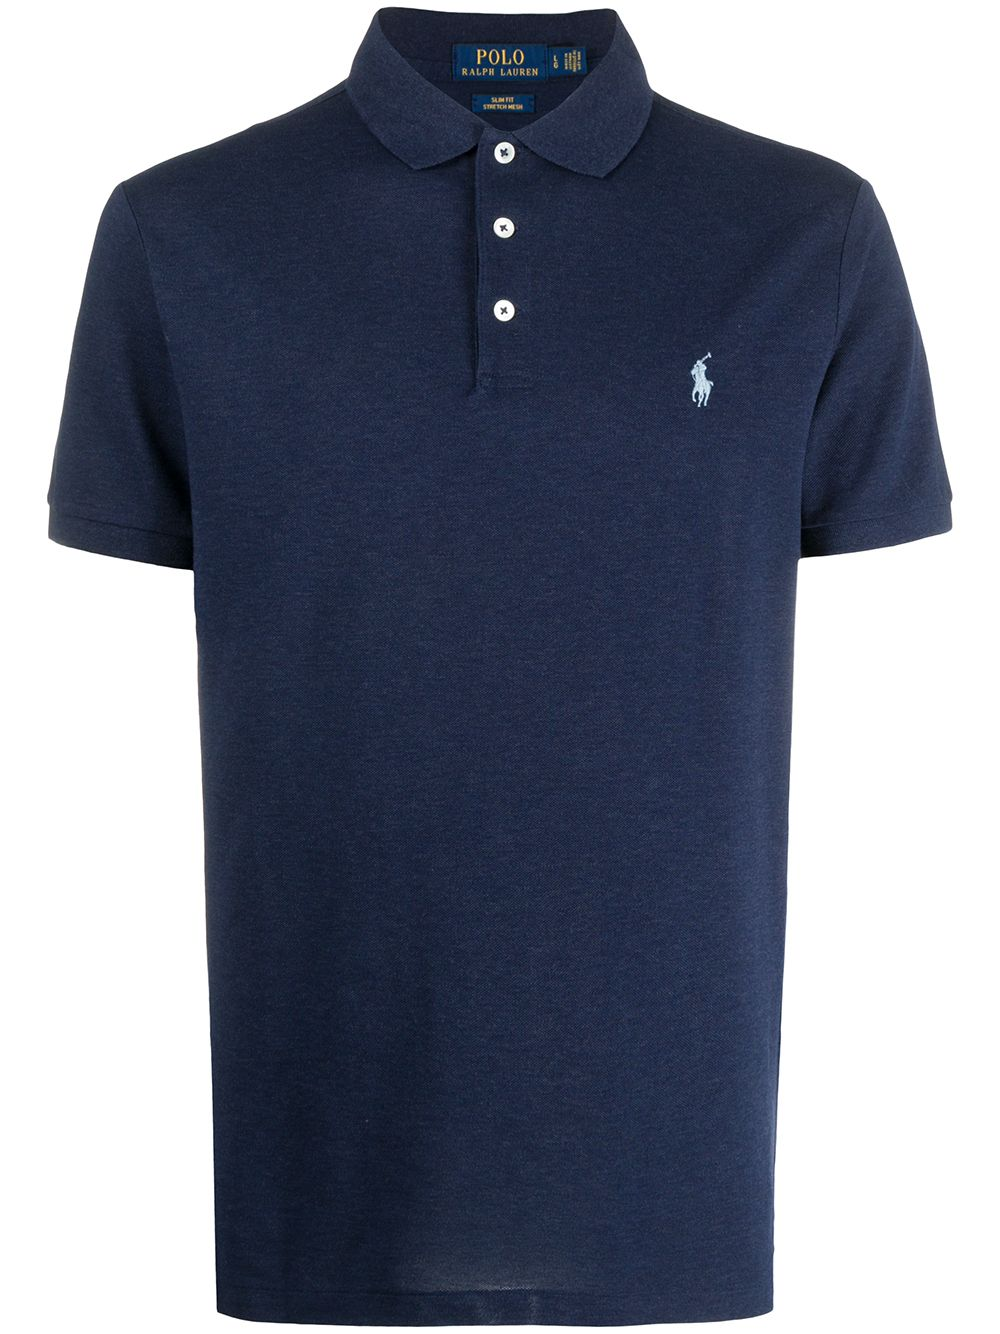 POLO RALPH LAUREN | Polo Ralph Lauren рубашка поло с вышитым логотипом | Clouty